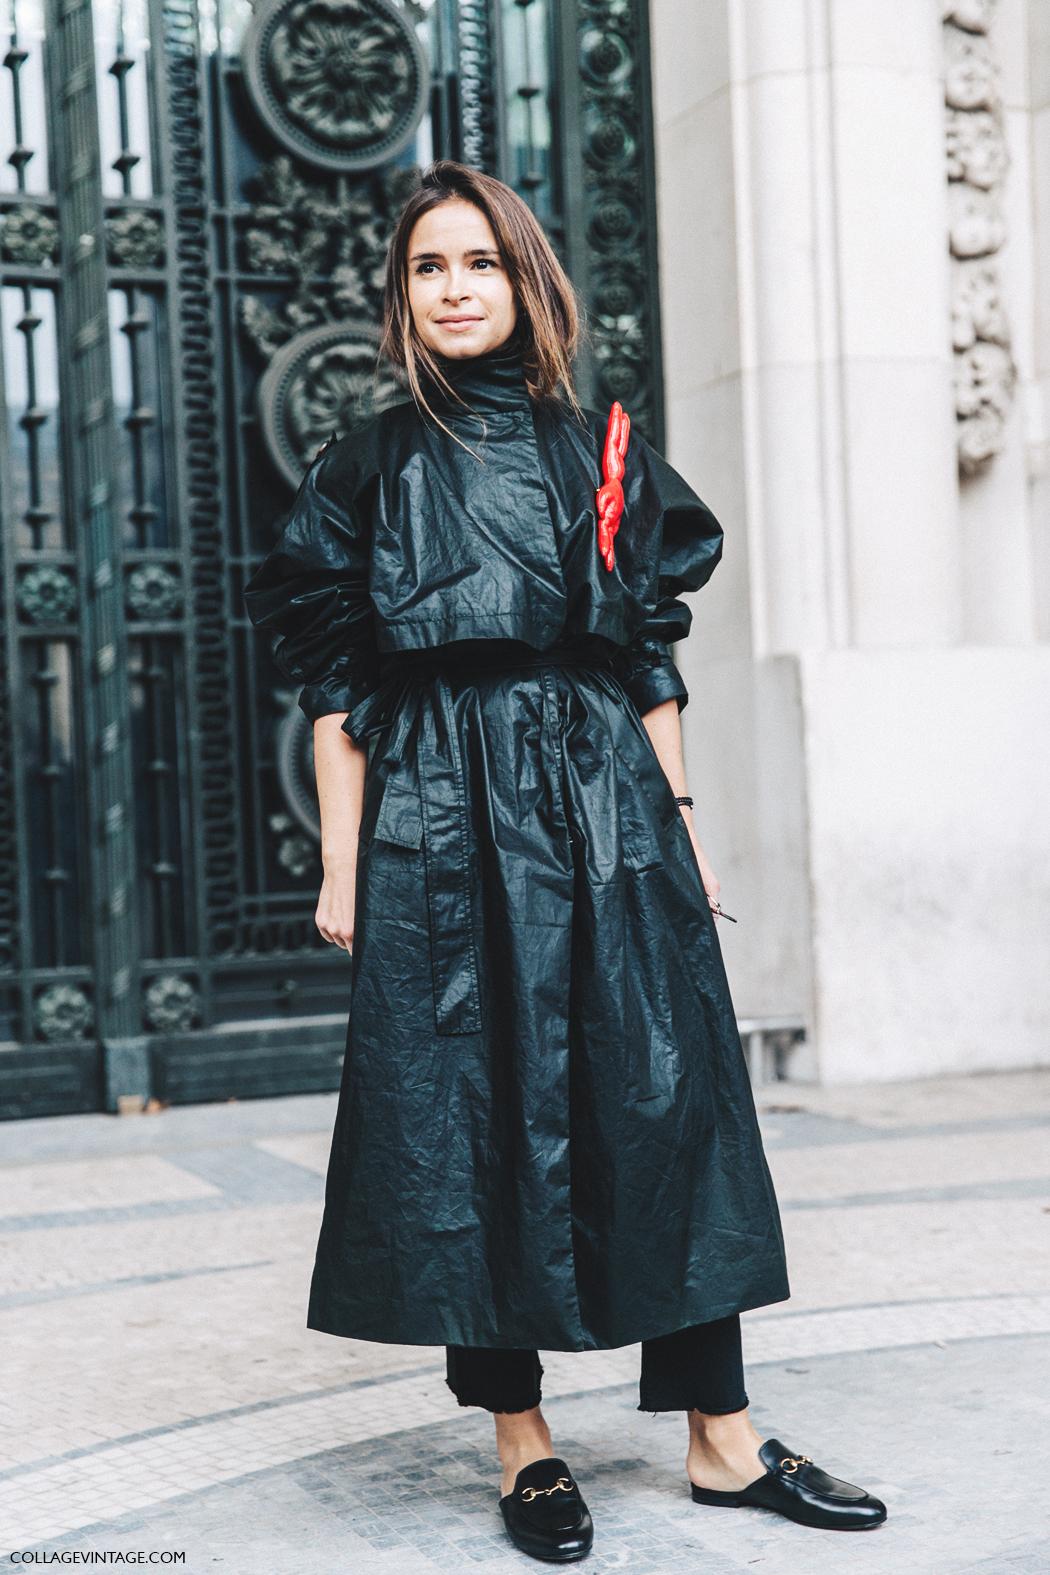 PFW-Paris_Fashion_Week_Fall_2016-Street_Style-Collage_Vintage-Miroslava_Duma-Awake-5